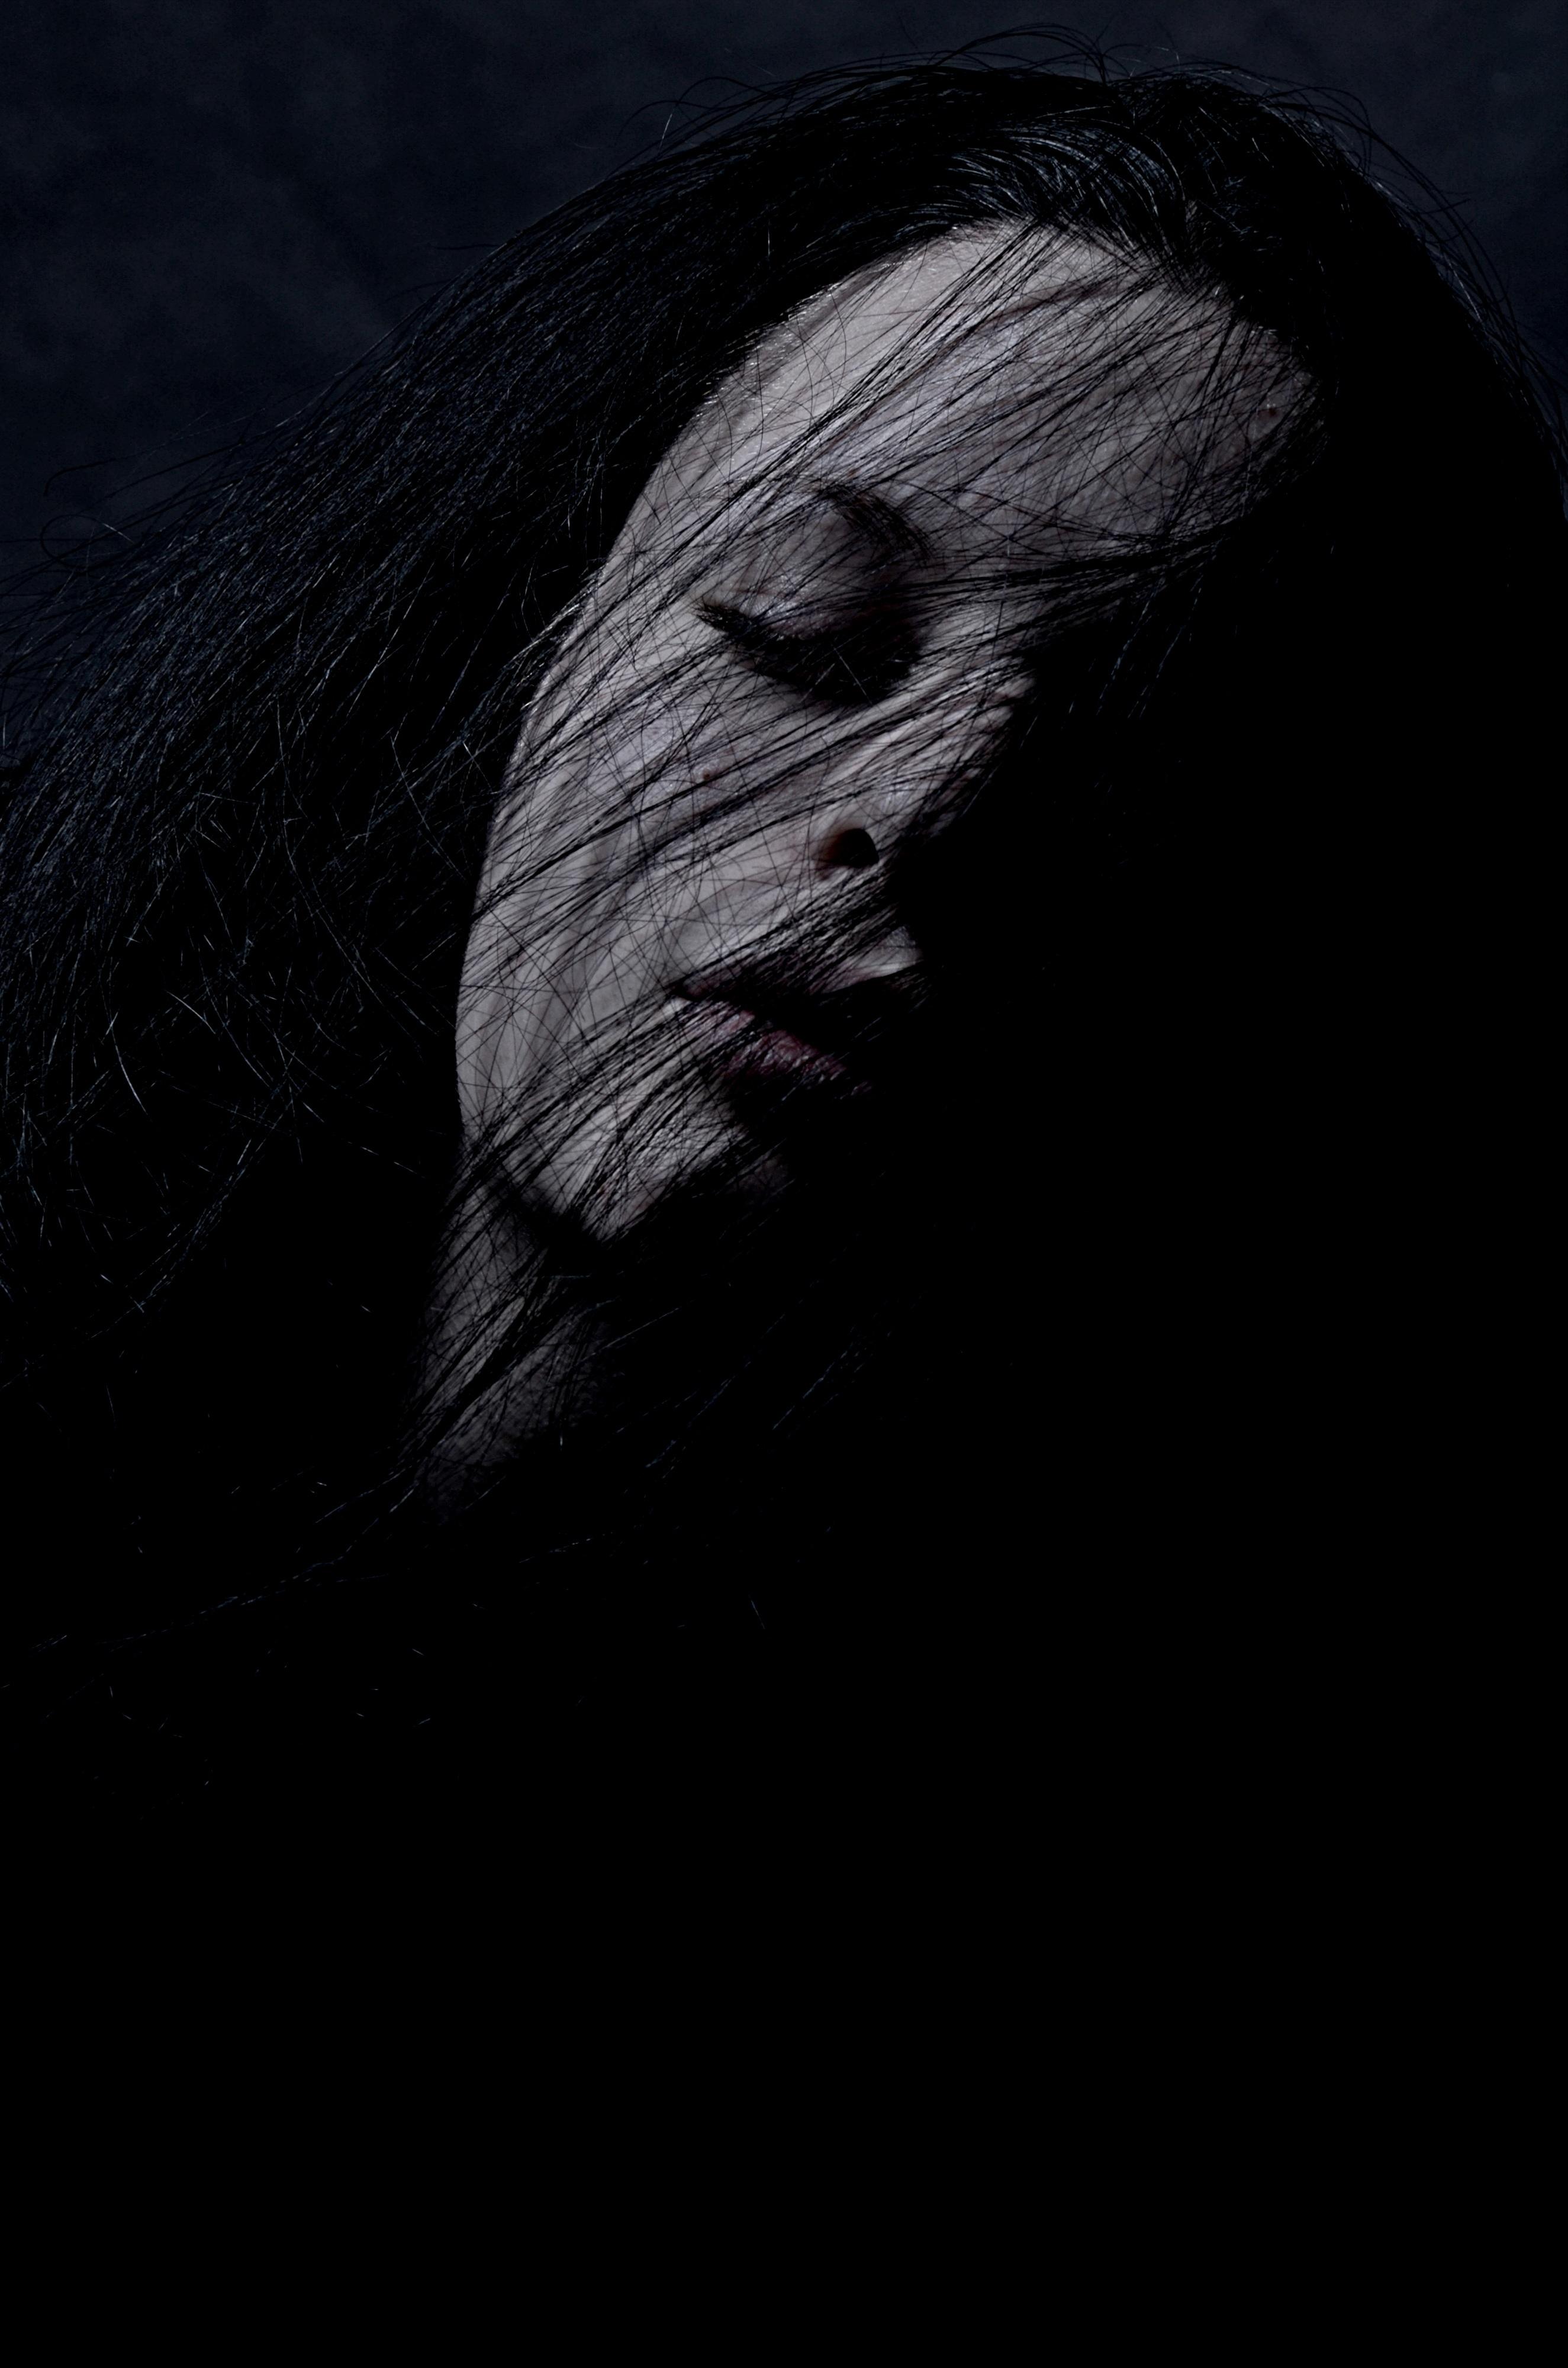 Gambar Bayangan Hitam Cahaya Hitam Dan Putih Gadis Rambut Kesedihan Kegelapan Satu Warna Merapatkan Tubuh Manusia Mata Kepala Organ Depresi Fotografi Monokrom 2649x4000 836628 Galeri Foto Pxhere